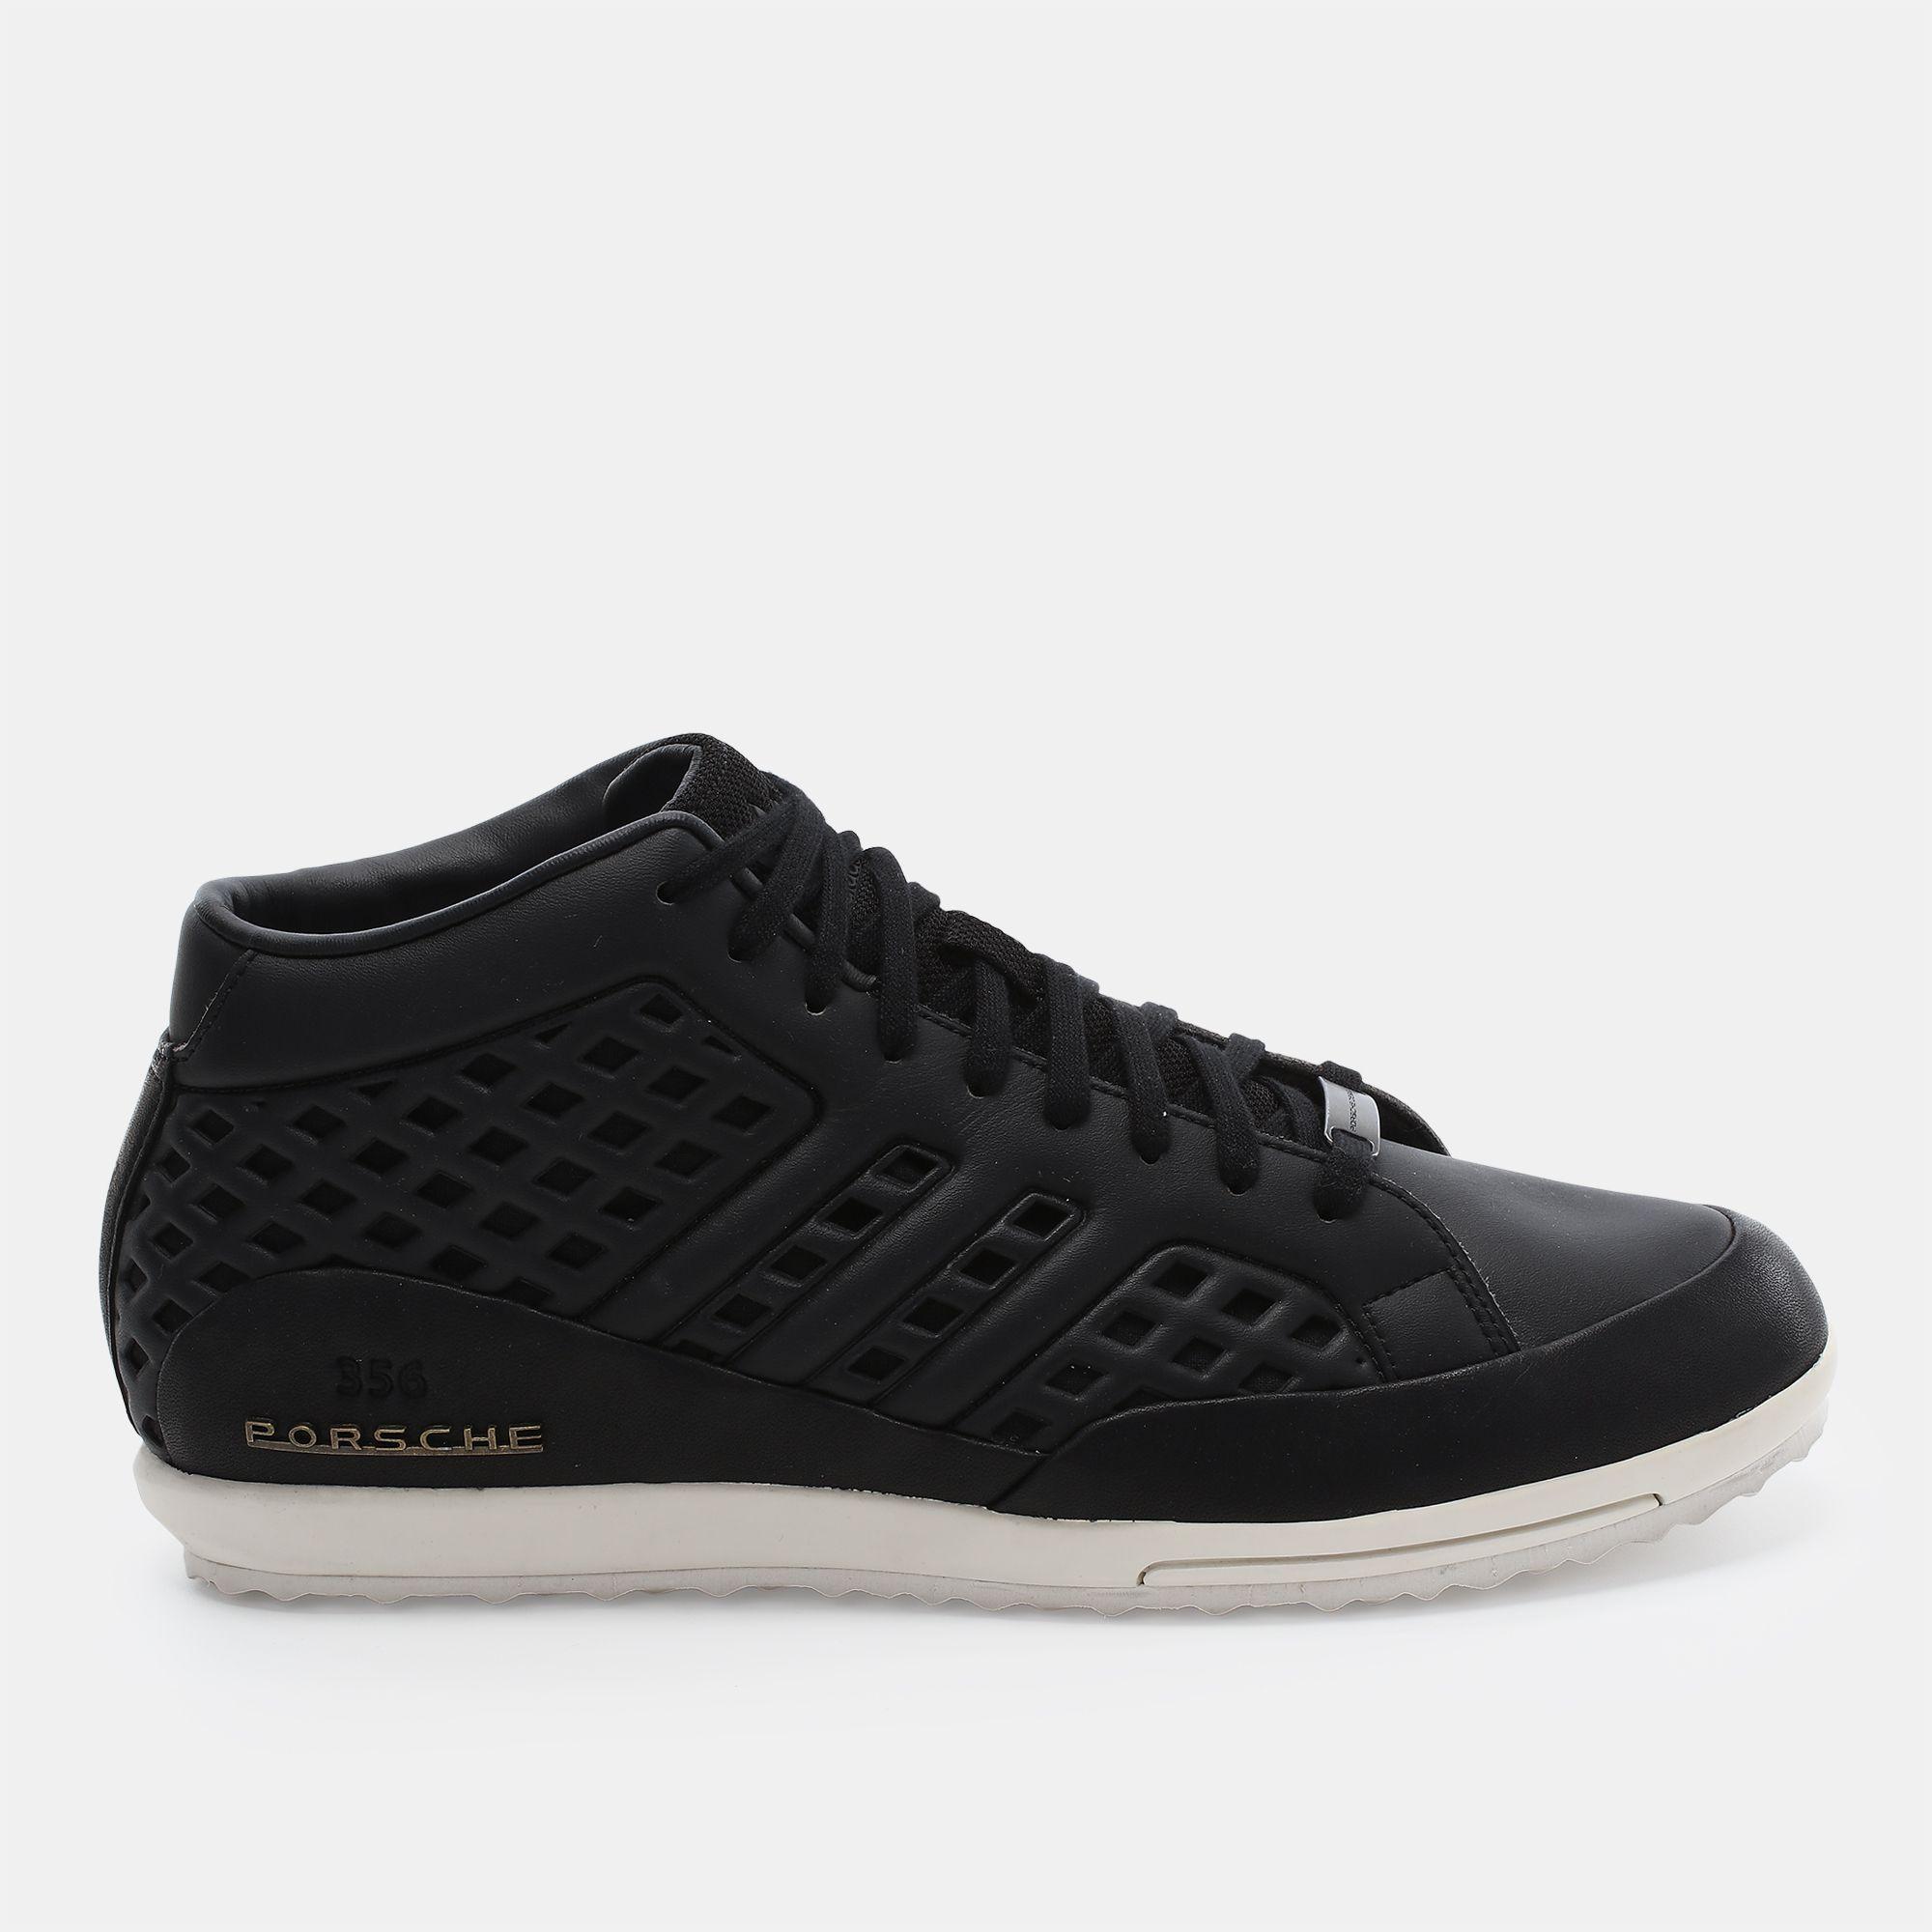 new arrival 8db76 b7d73 Shop Black adidas Porsche 356 Mid 1.3 Shoe for Mens by ...